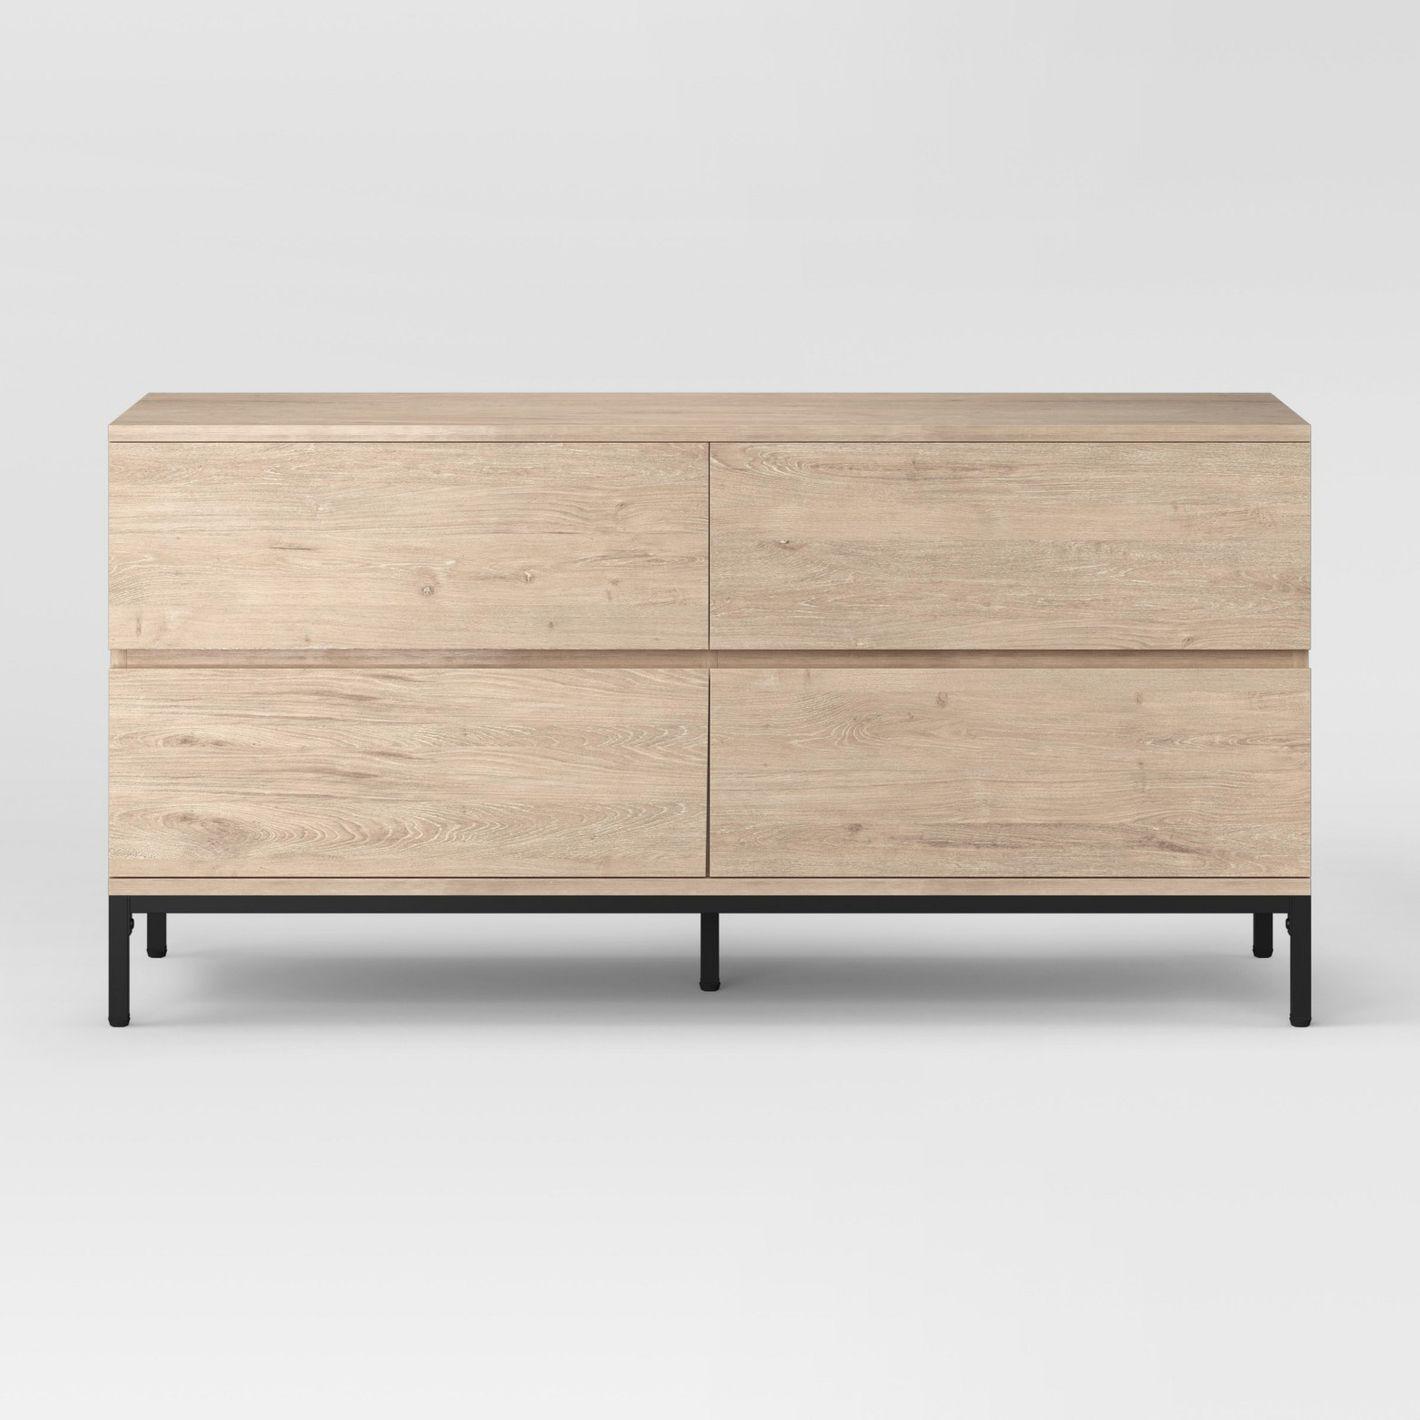 Best Dressers Under $500 According to Interior Designers